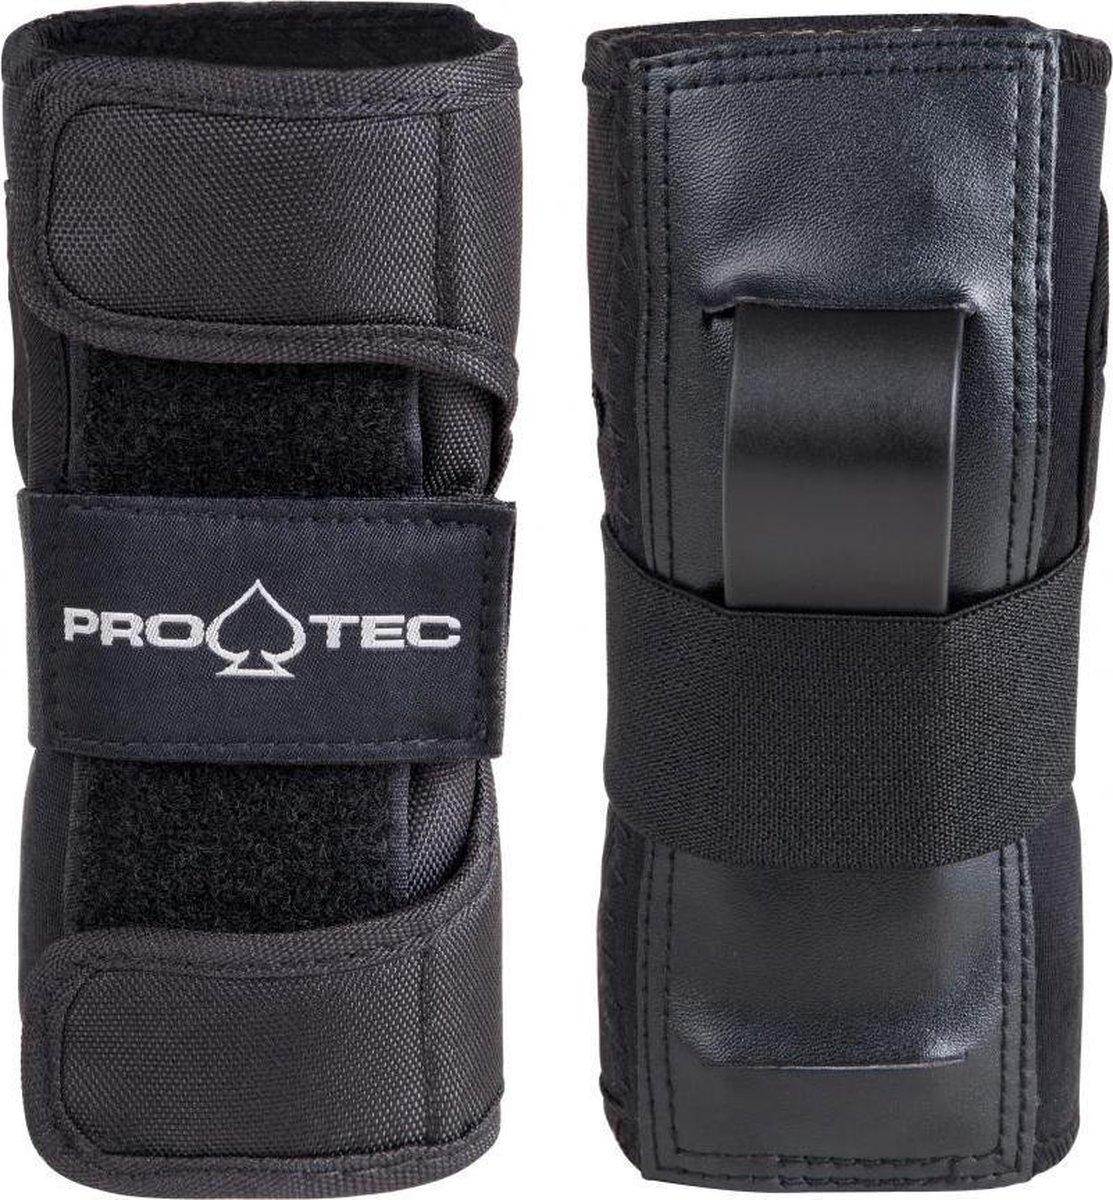 Pro-tec street pols beschermers